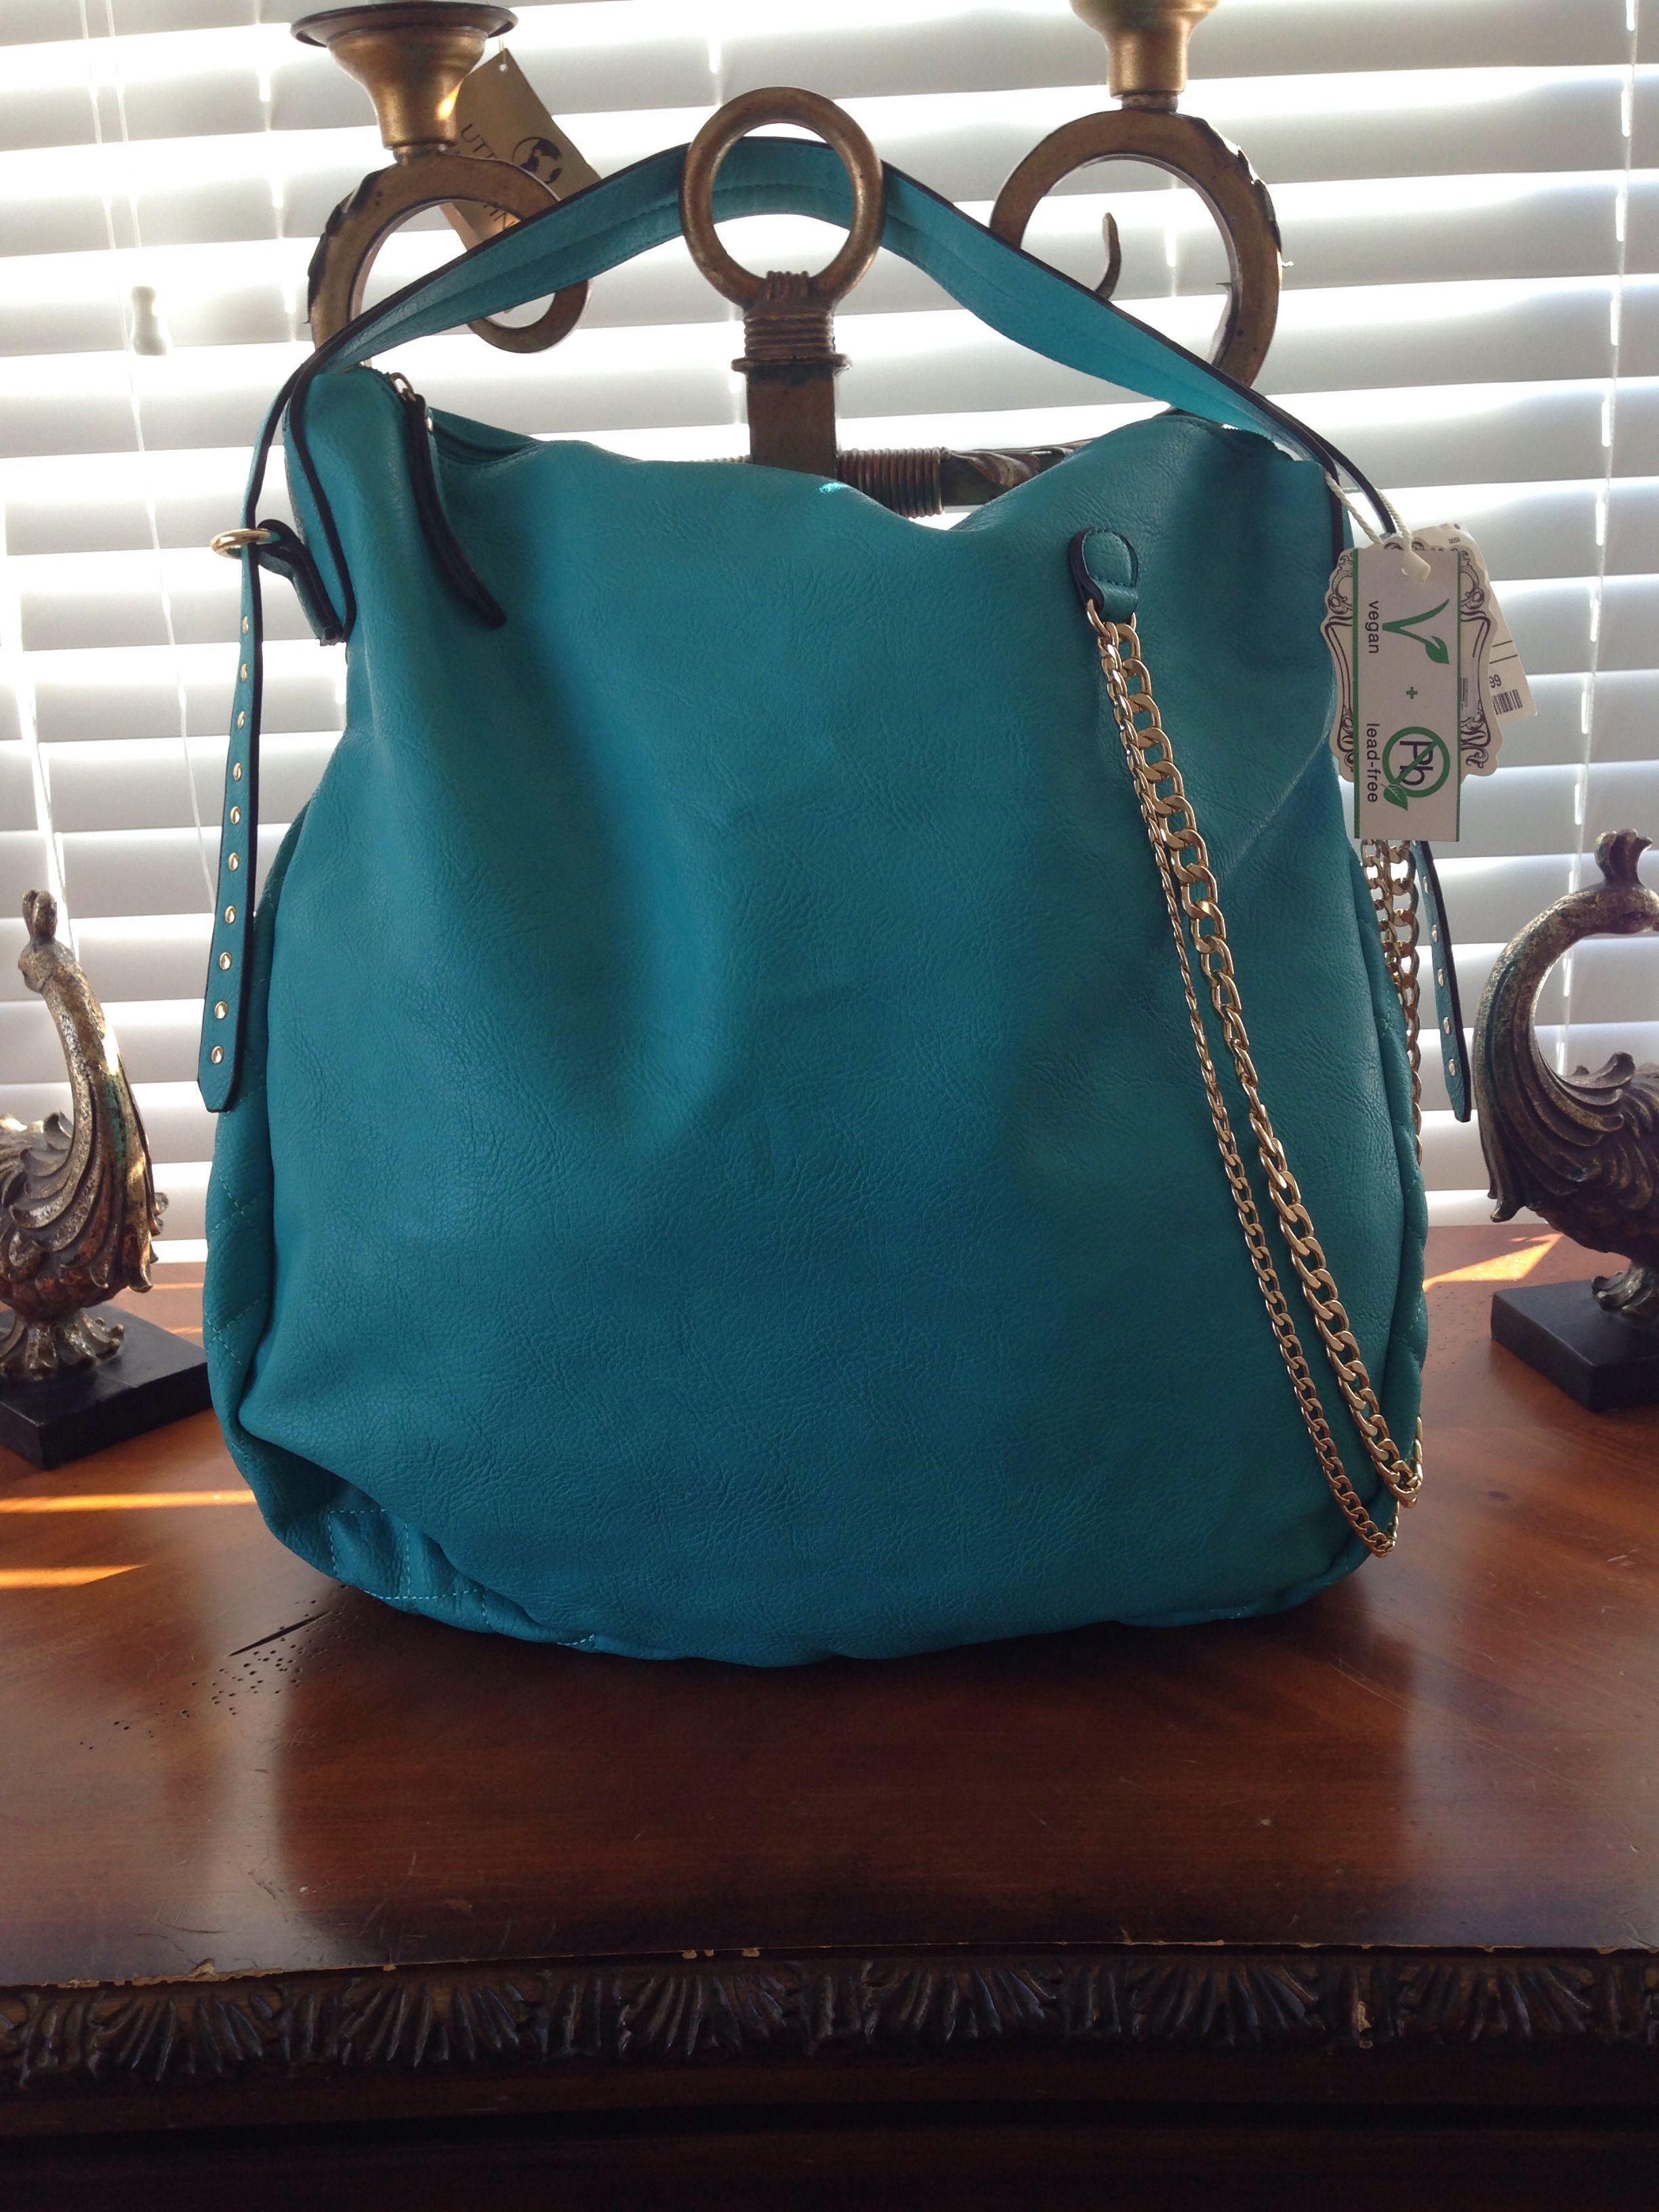 Authentic Alyssa Vegan Handbag